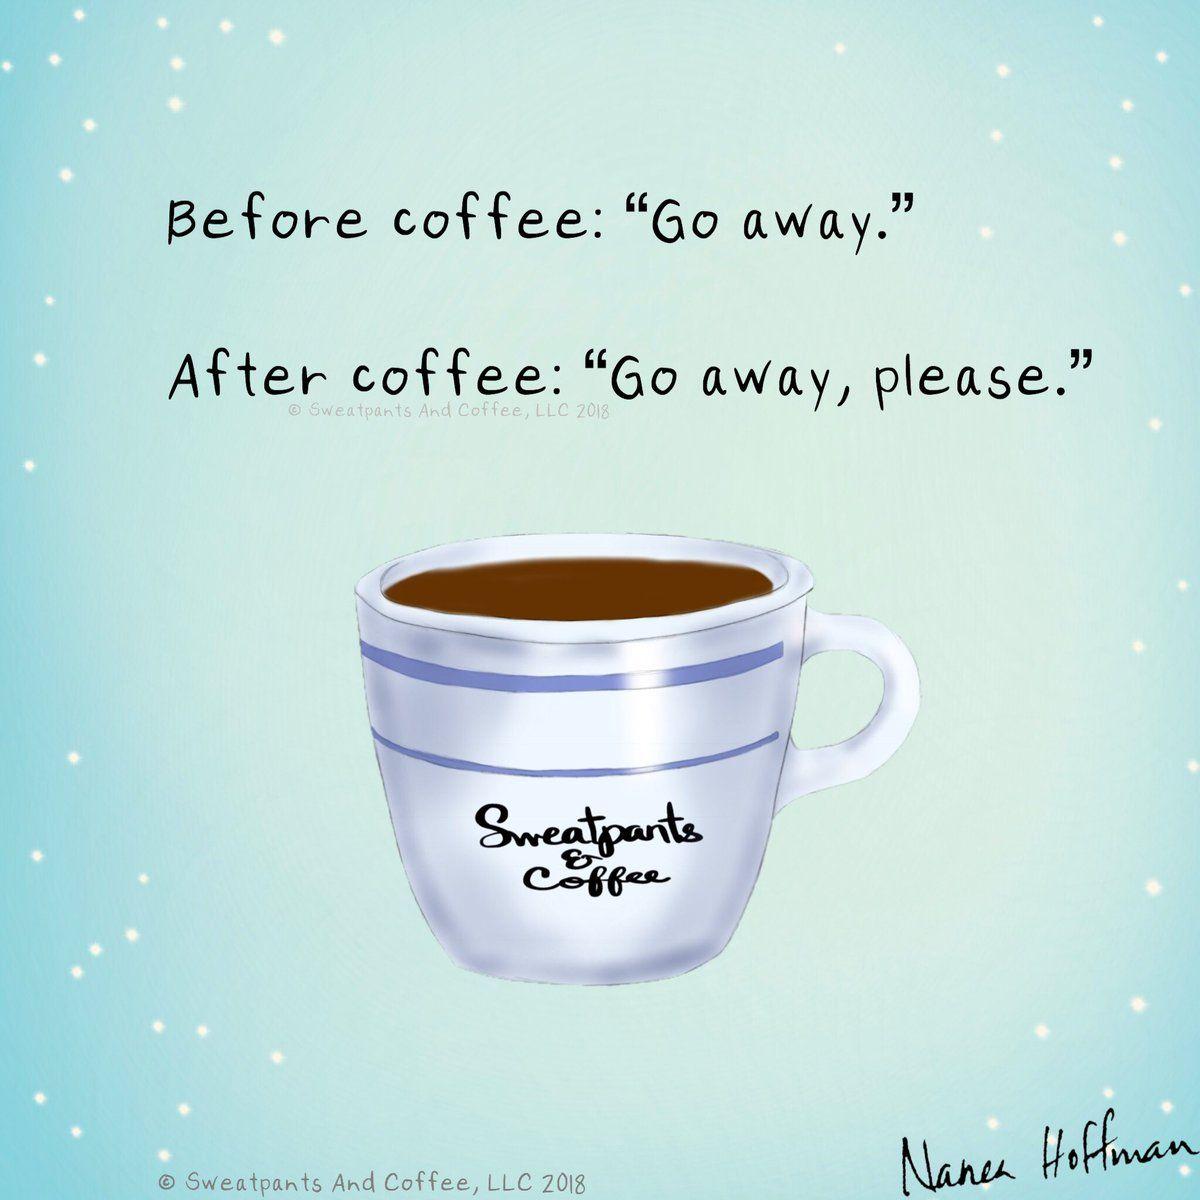 Sweatpants & Coffee on in 2019 | Coffee Corner | Coffee, Coffee ... #iLoveCoffee